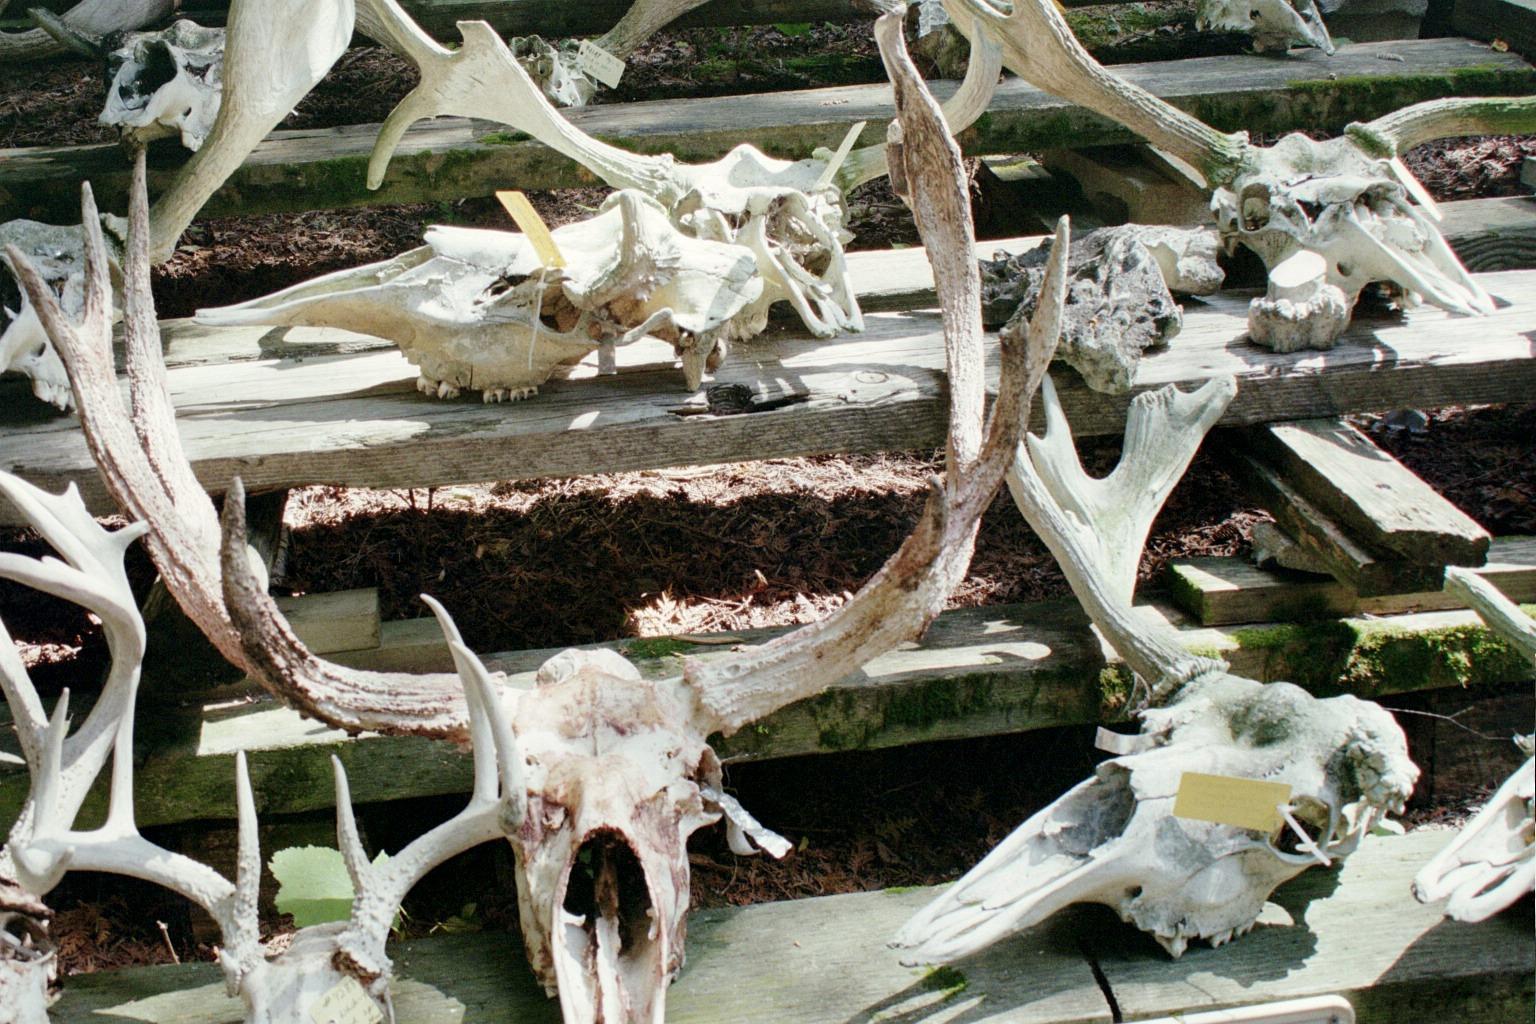 Image of moose skulls.